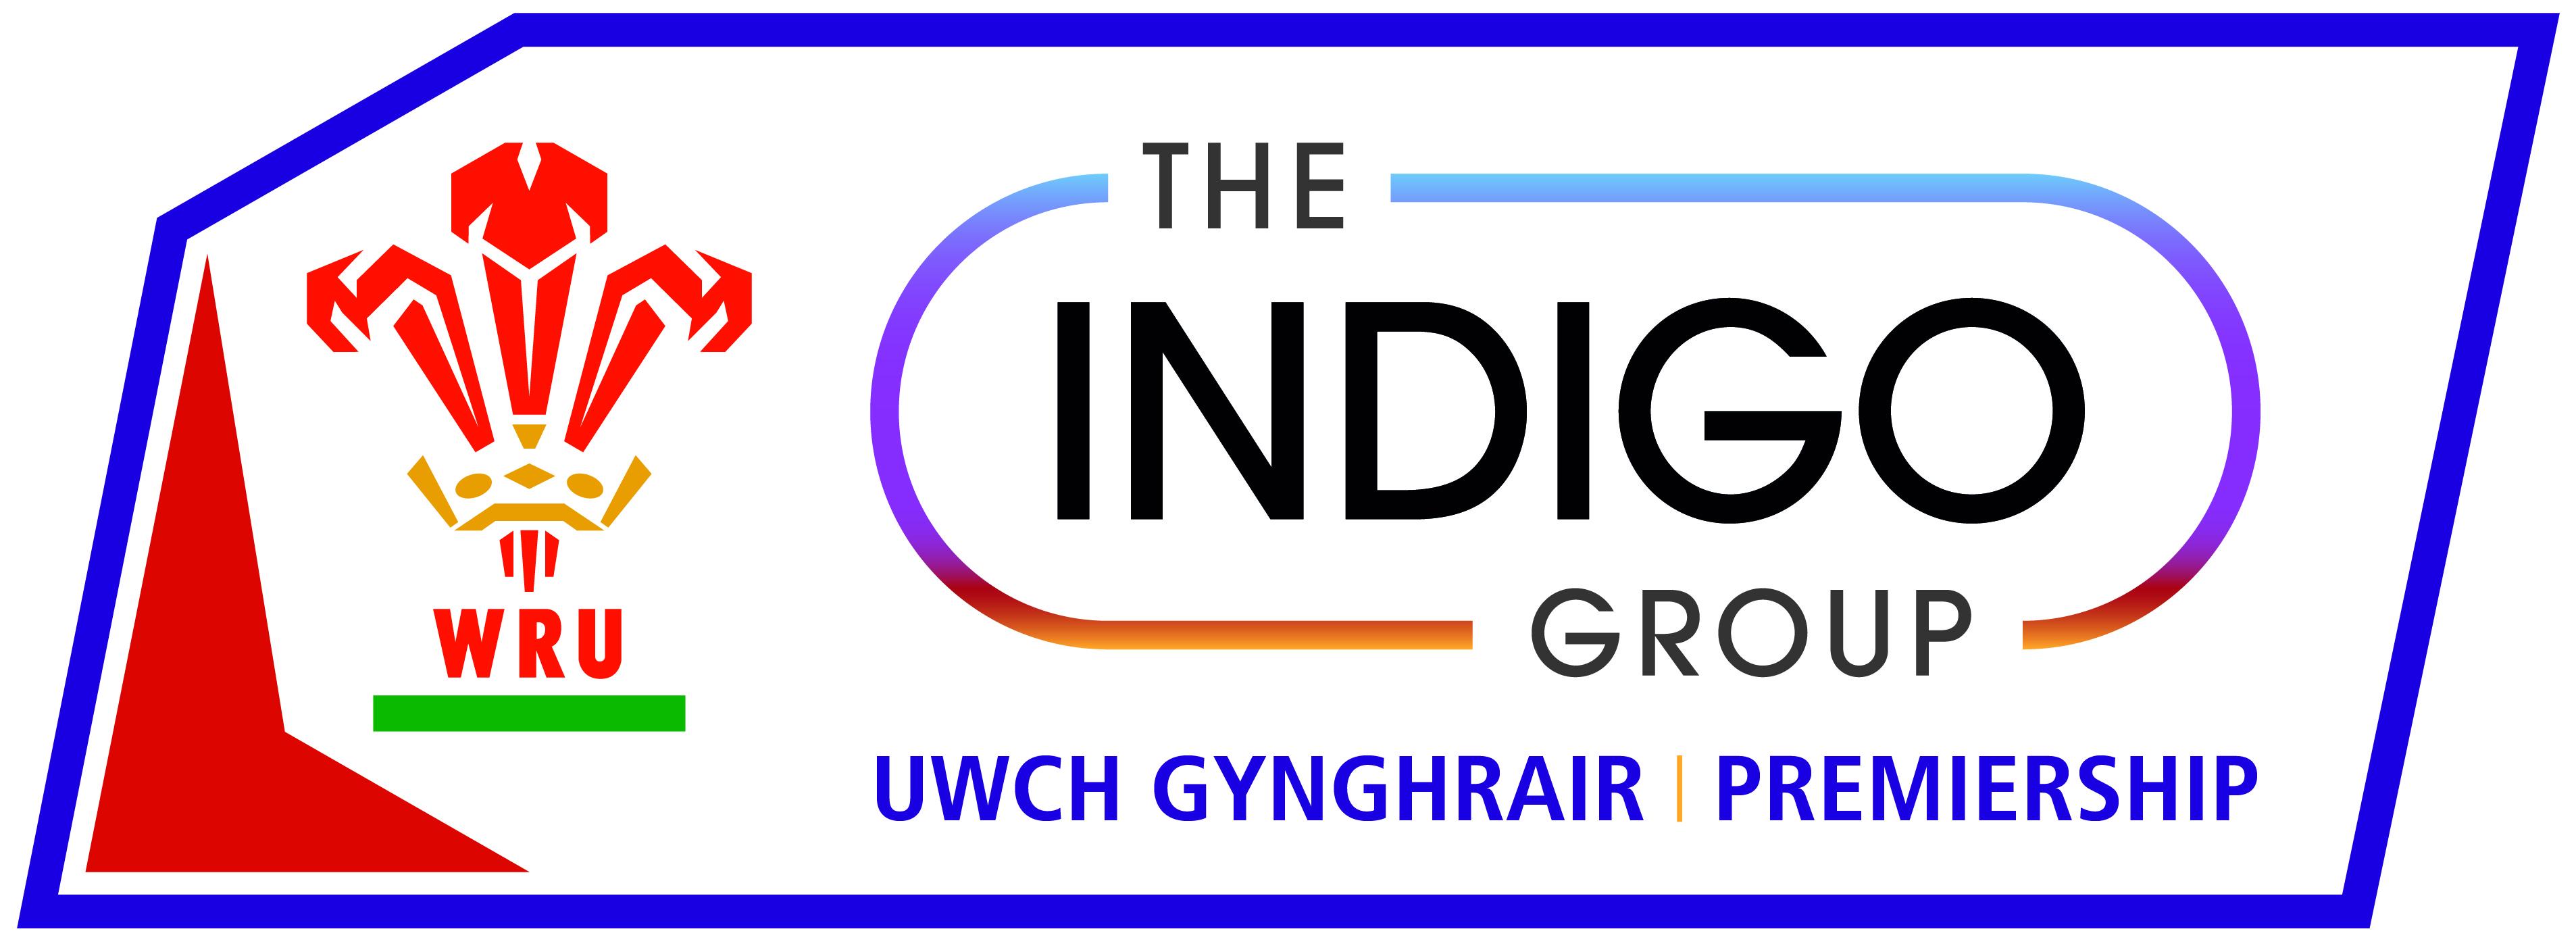 Indigo Group Premiership Fixtures Released